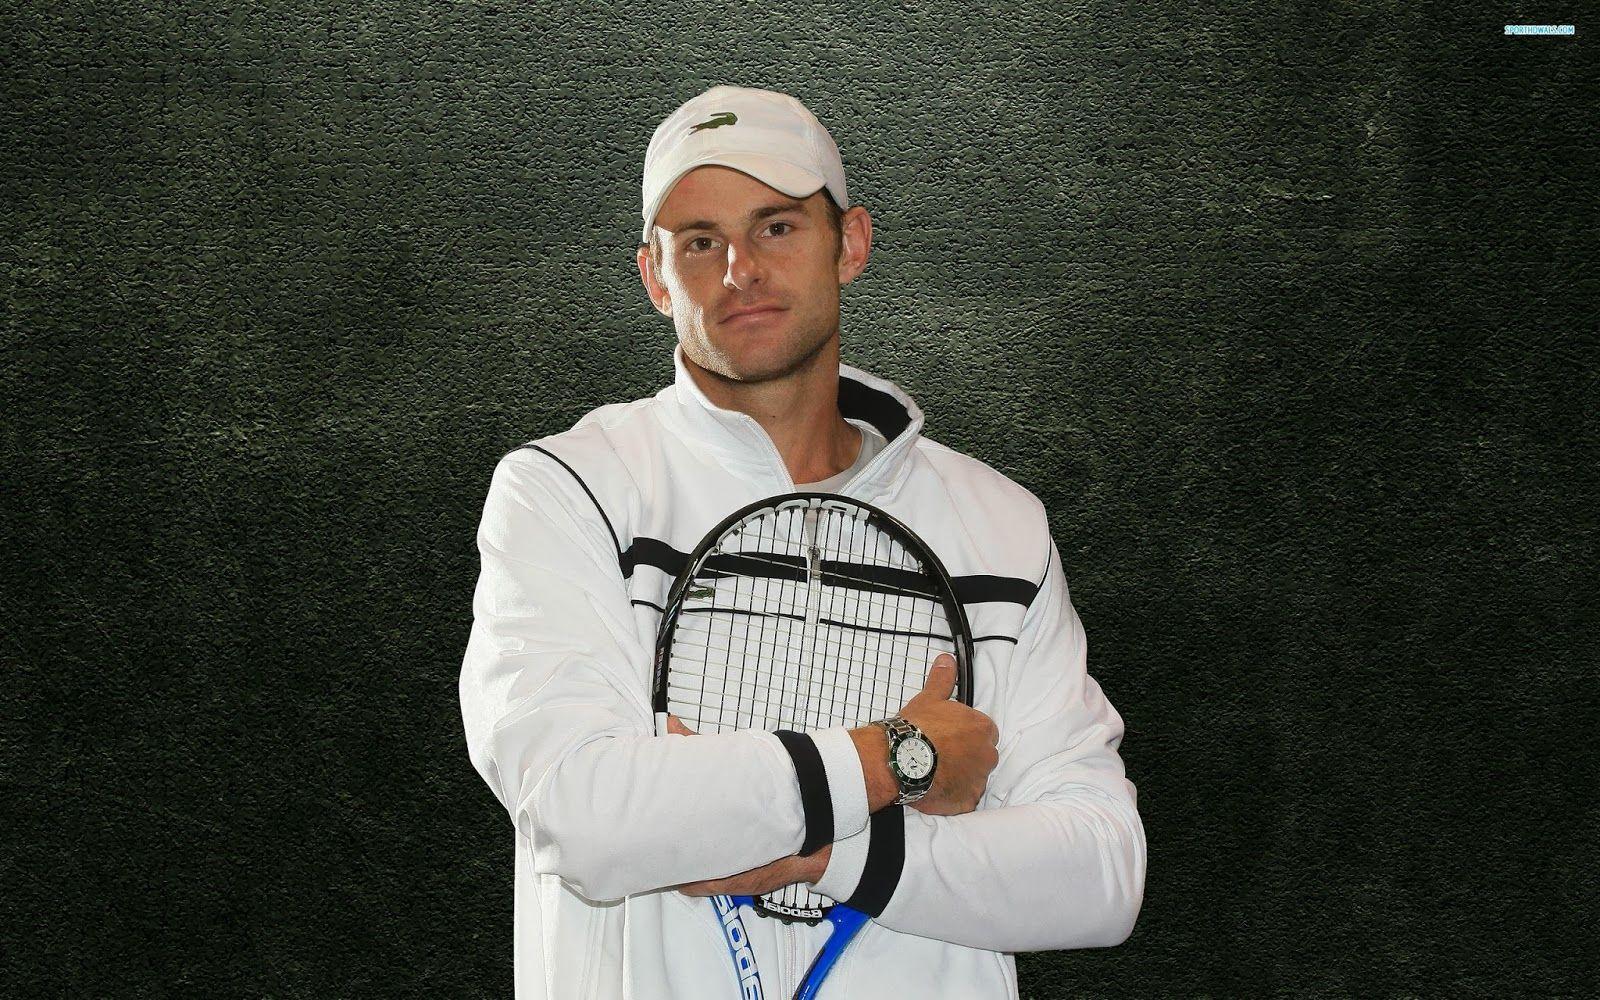 Andy Roddick HD 6 Tennis Wallpapers Pinterest